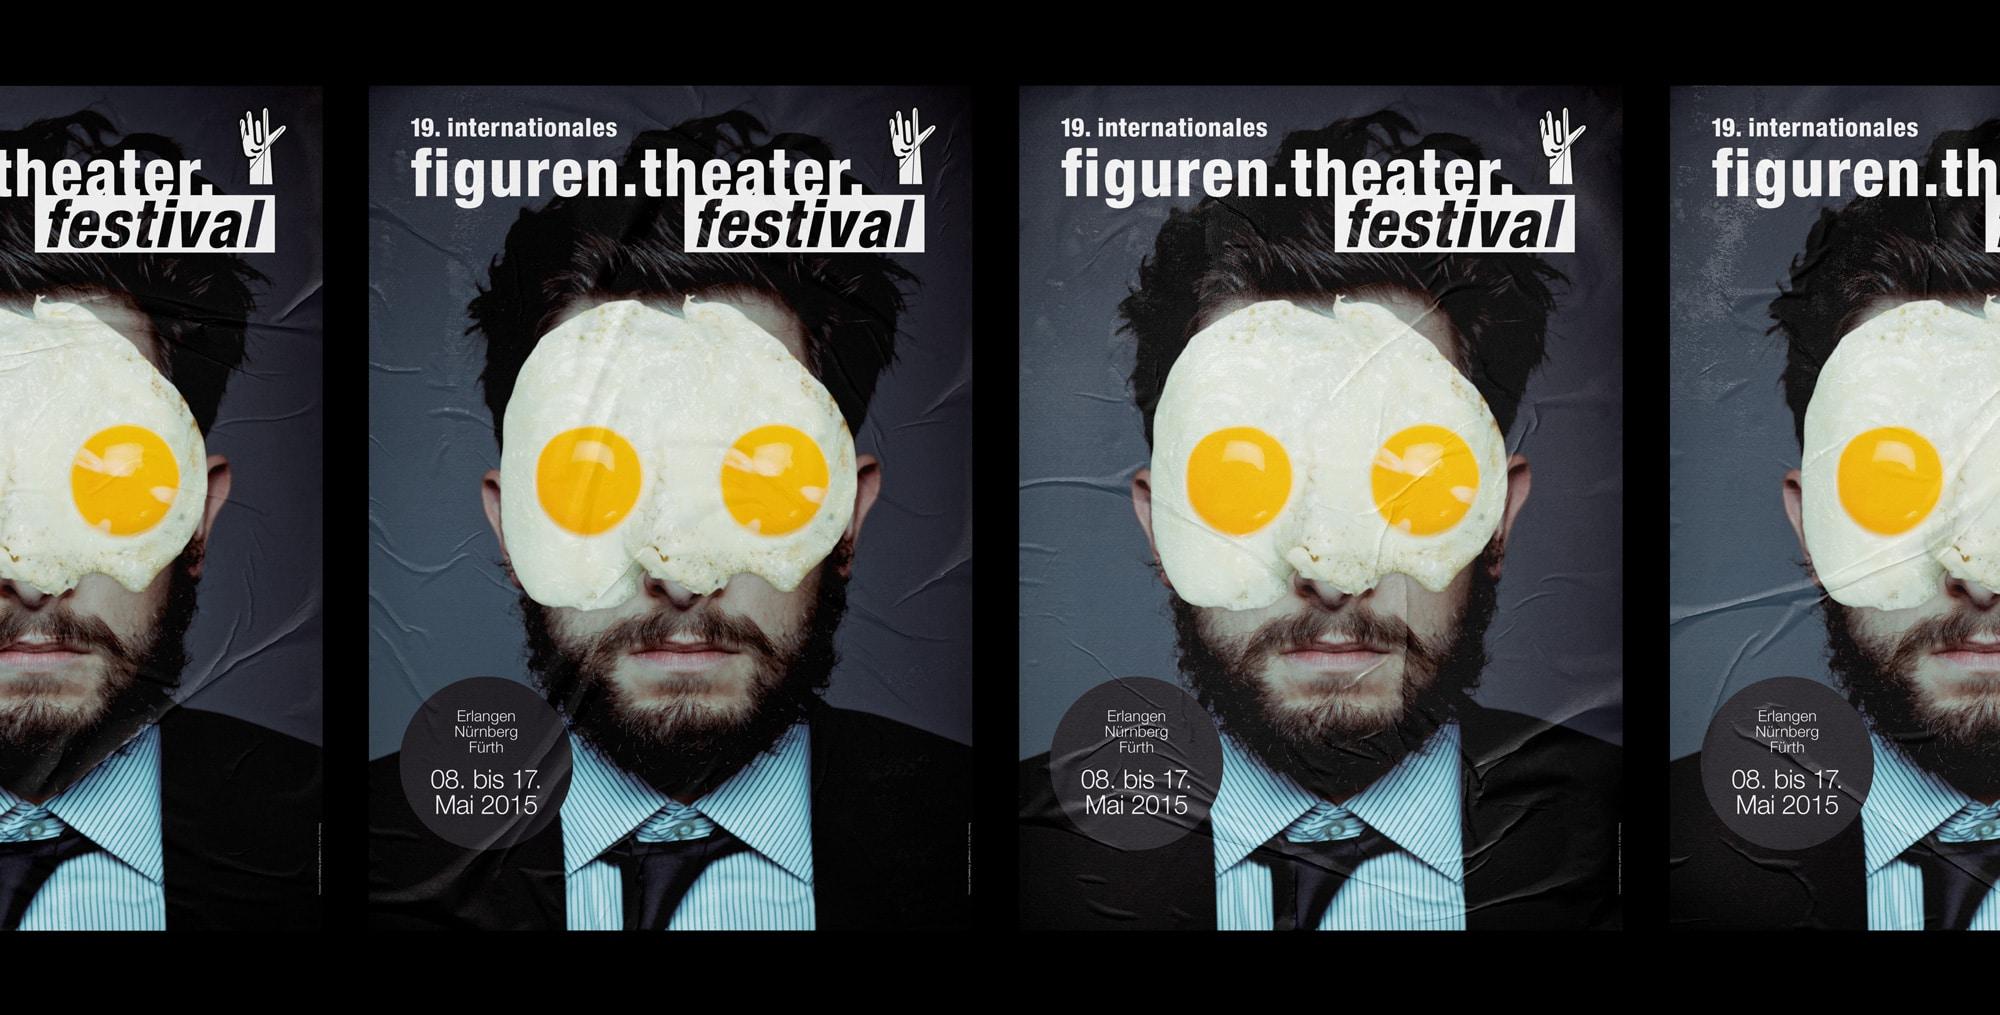 planx-internationales.figuren.theater.festival-2015-plakate03